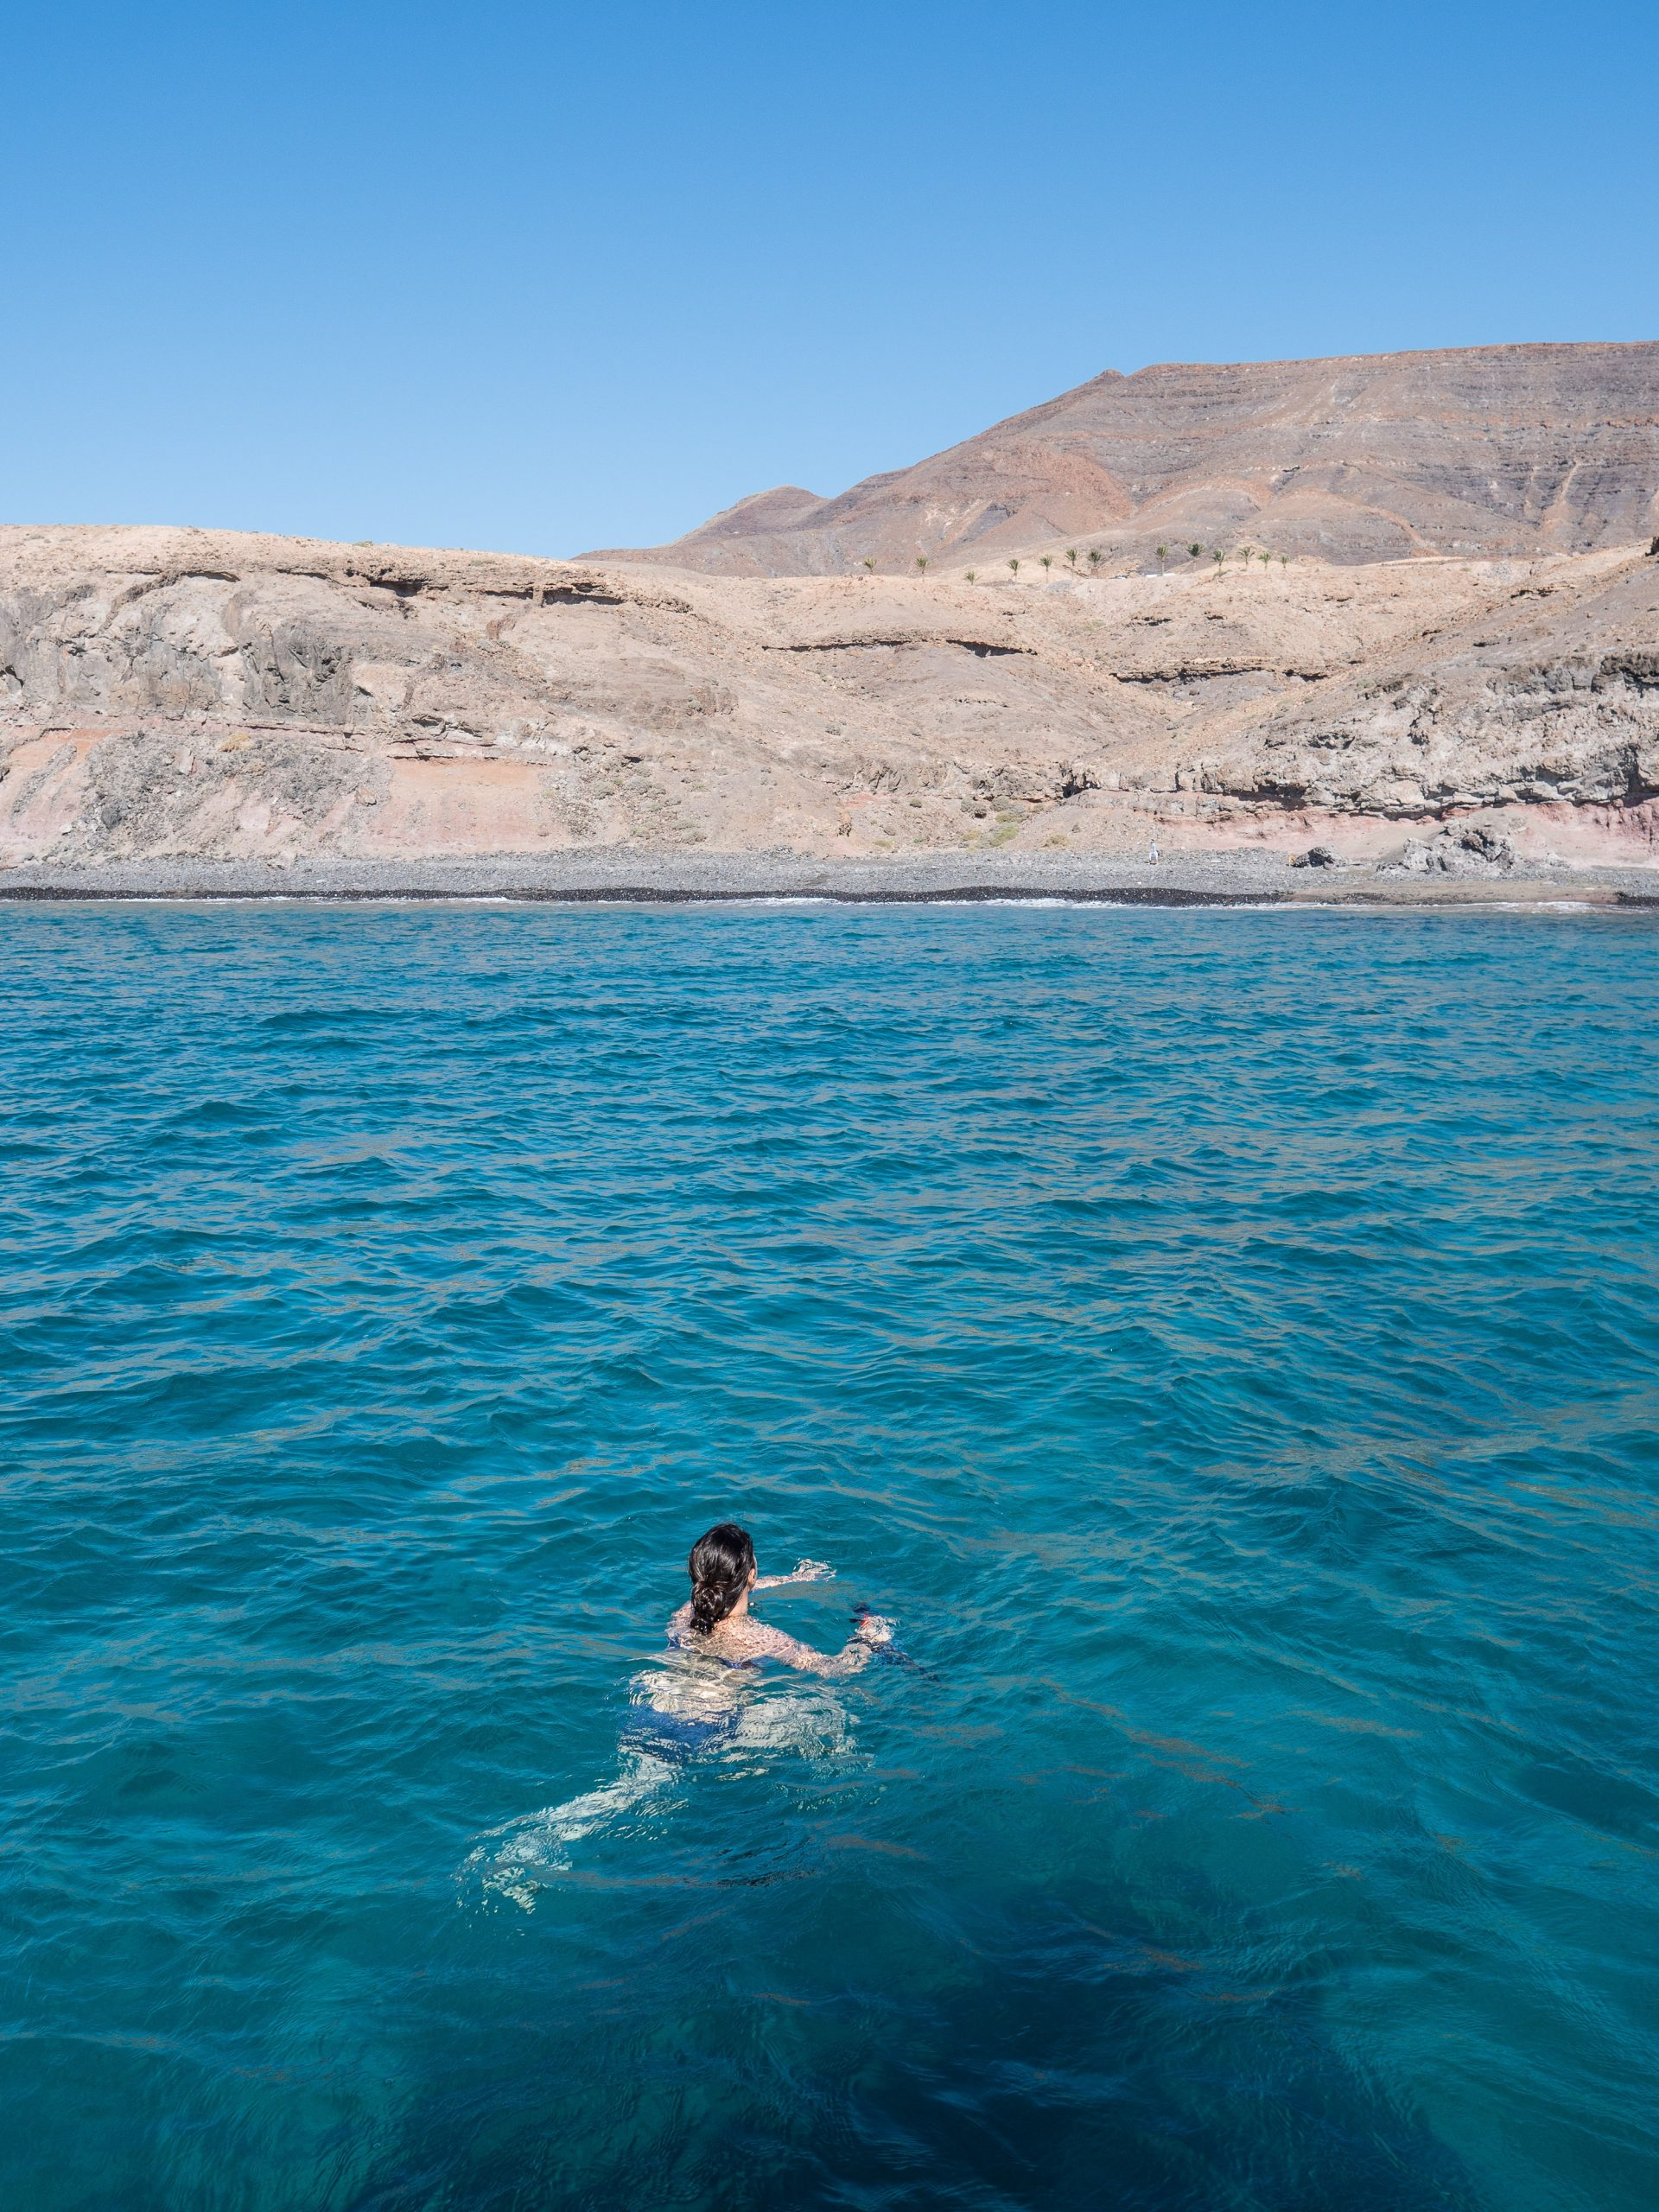 Plage à Morro jable, Fuerteventura